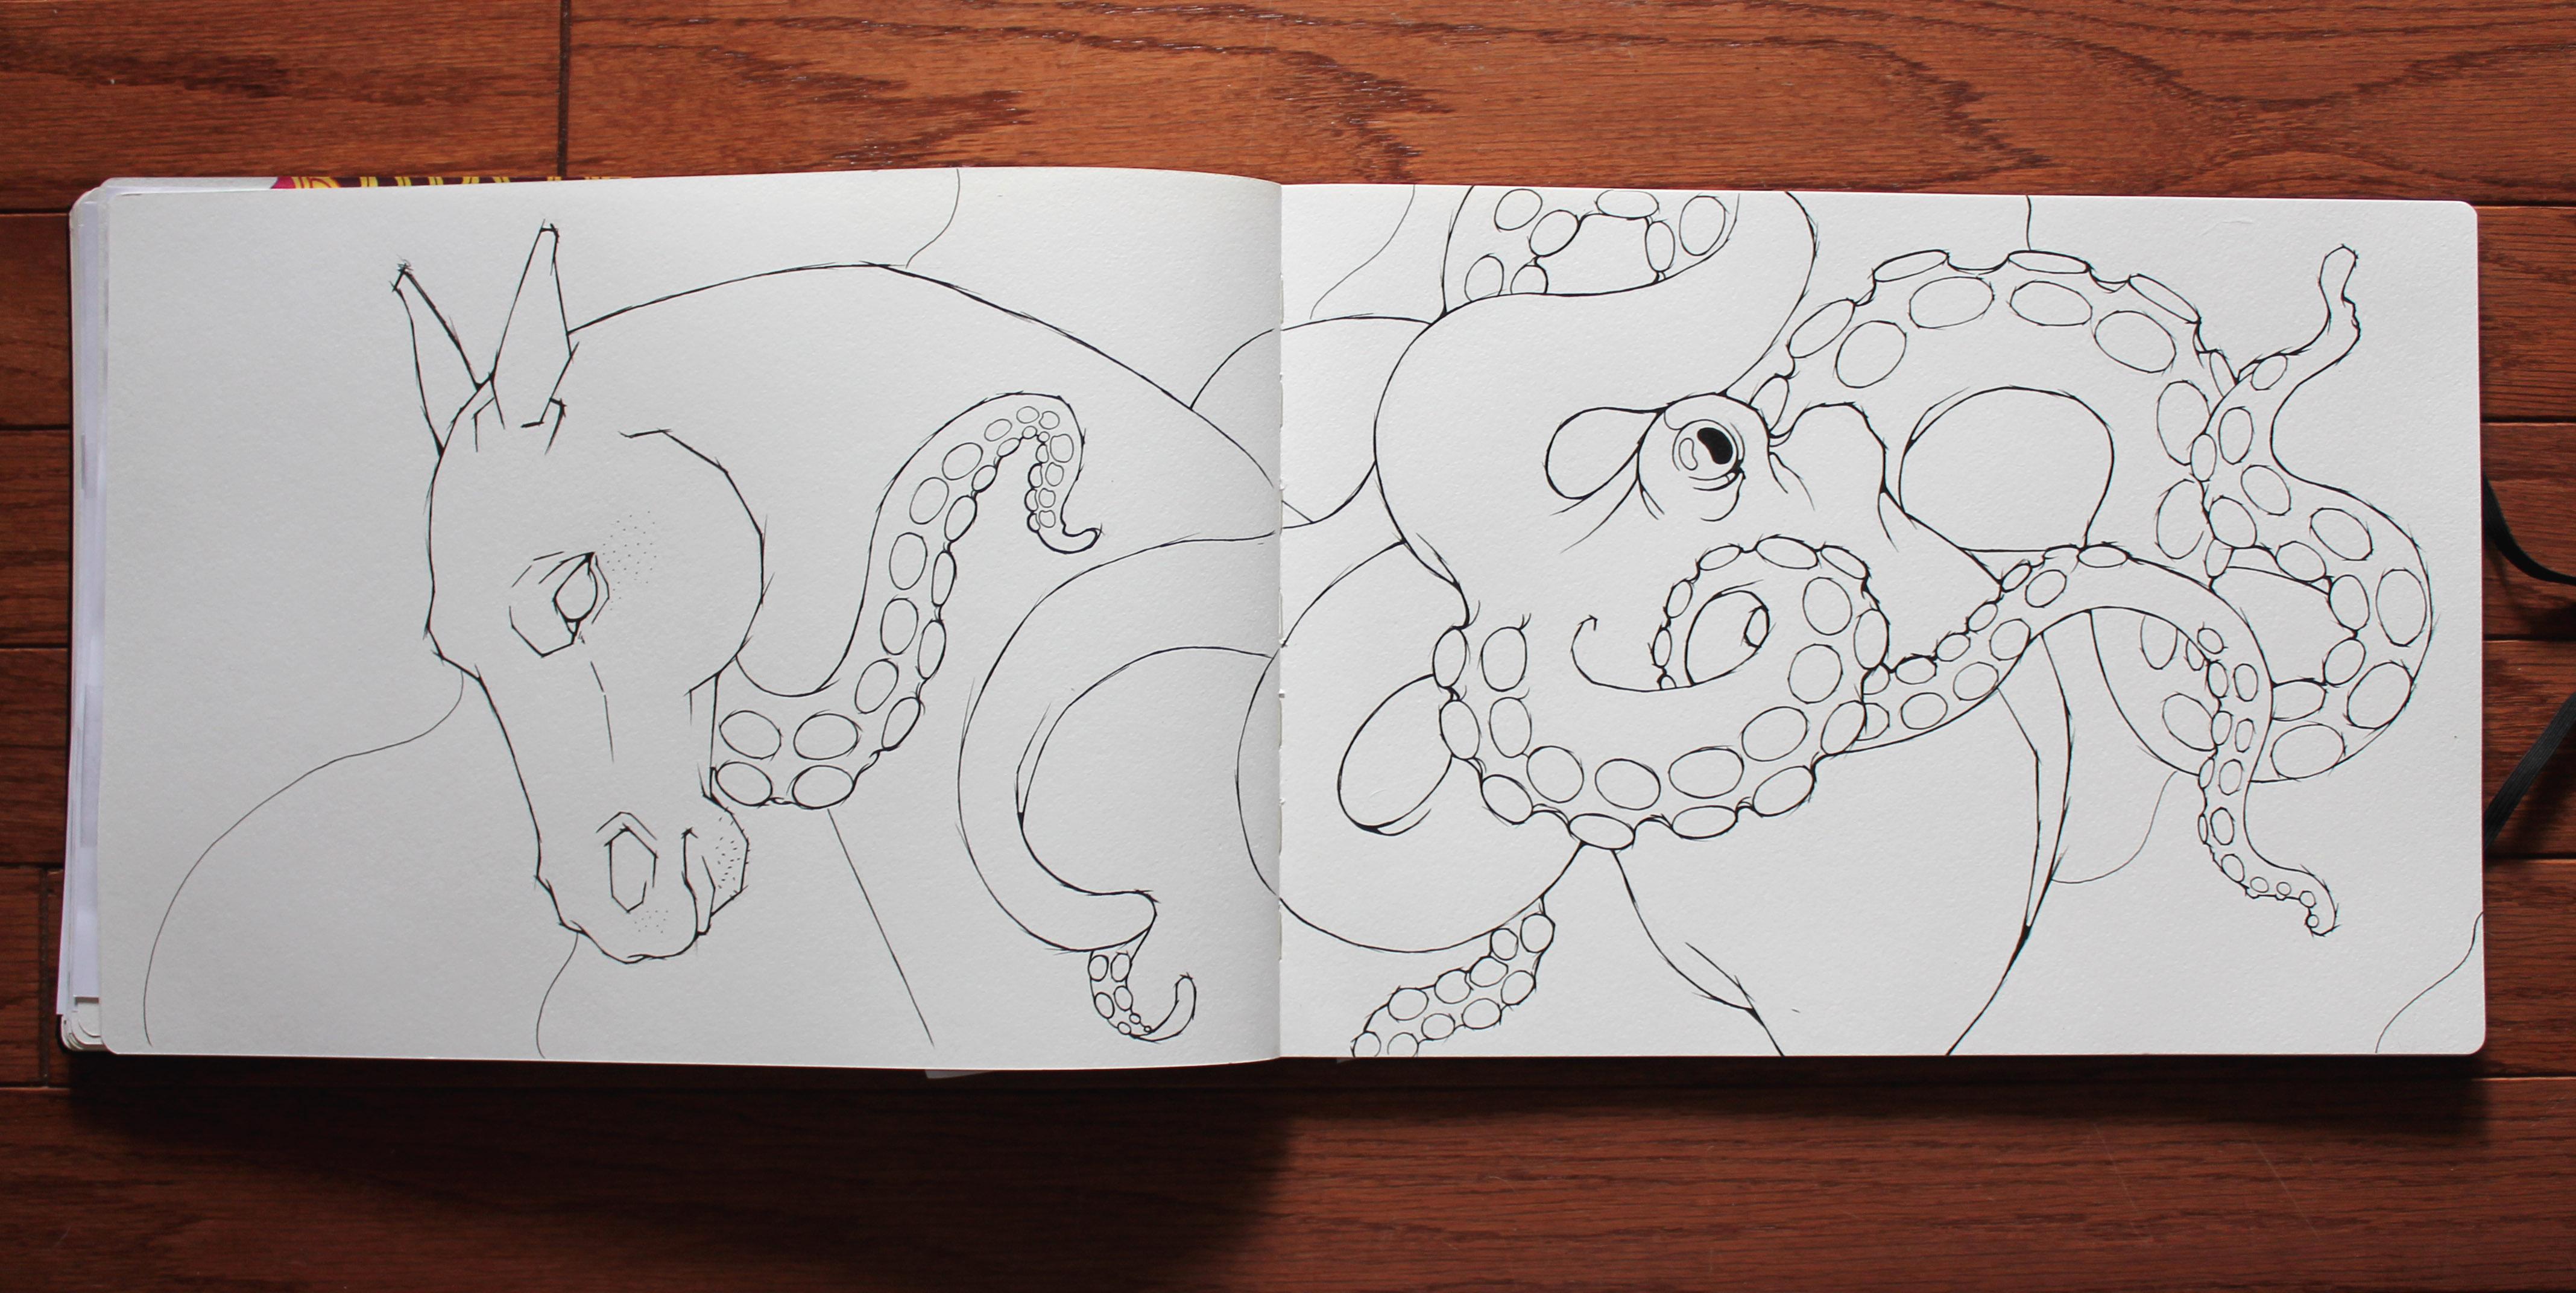 Octopus-Anneris Kondratas